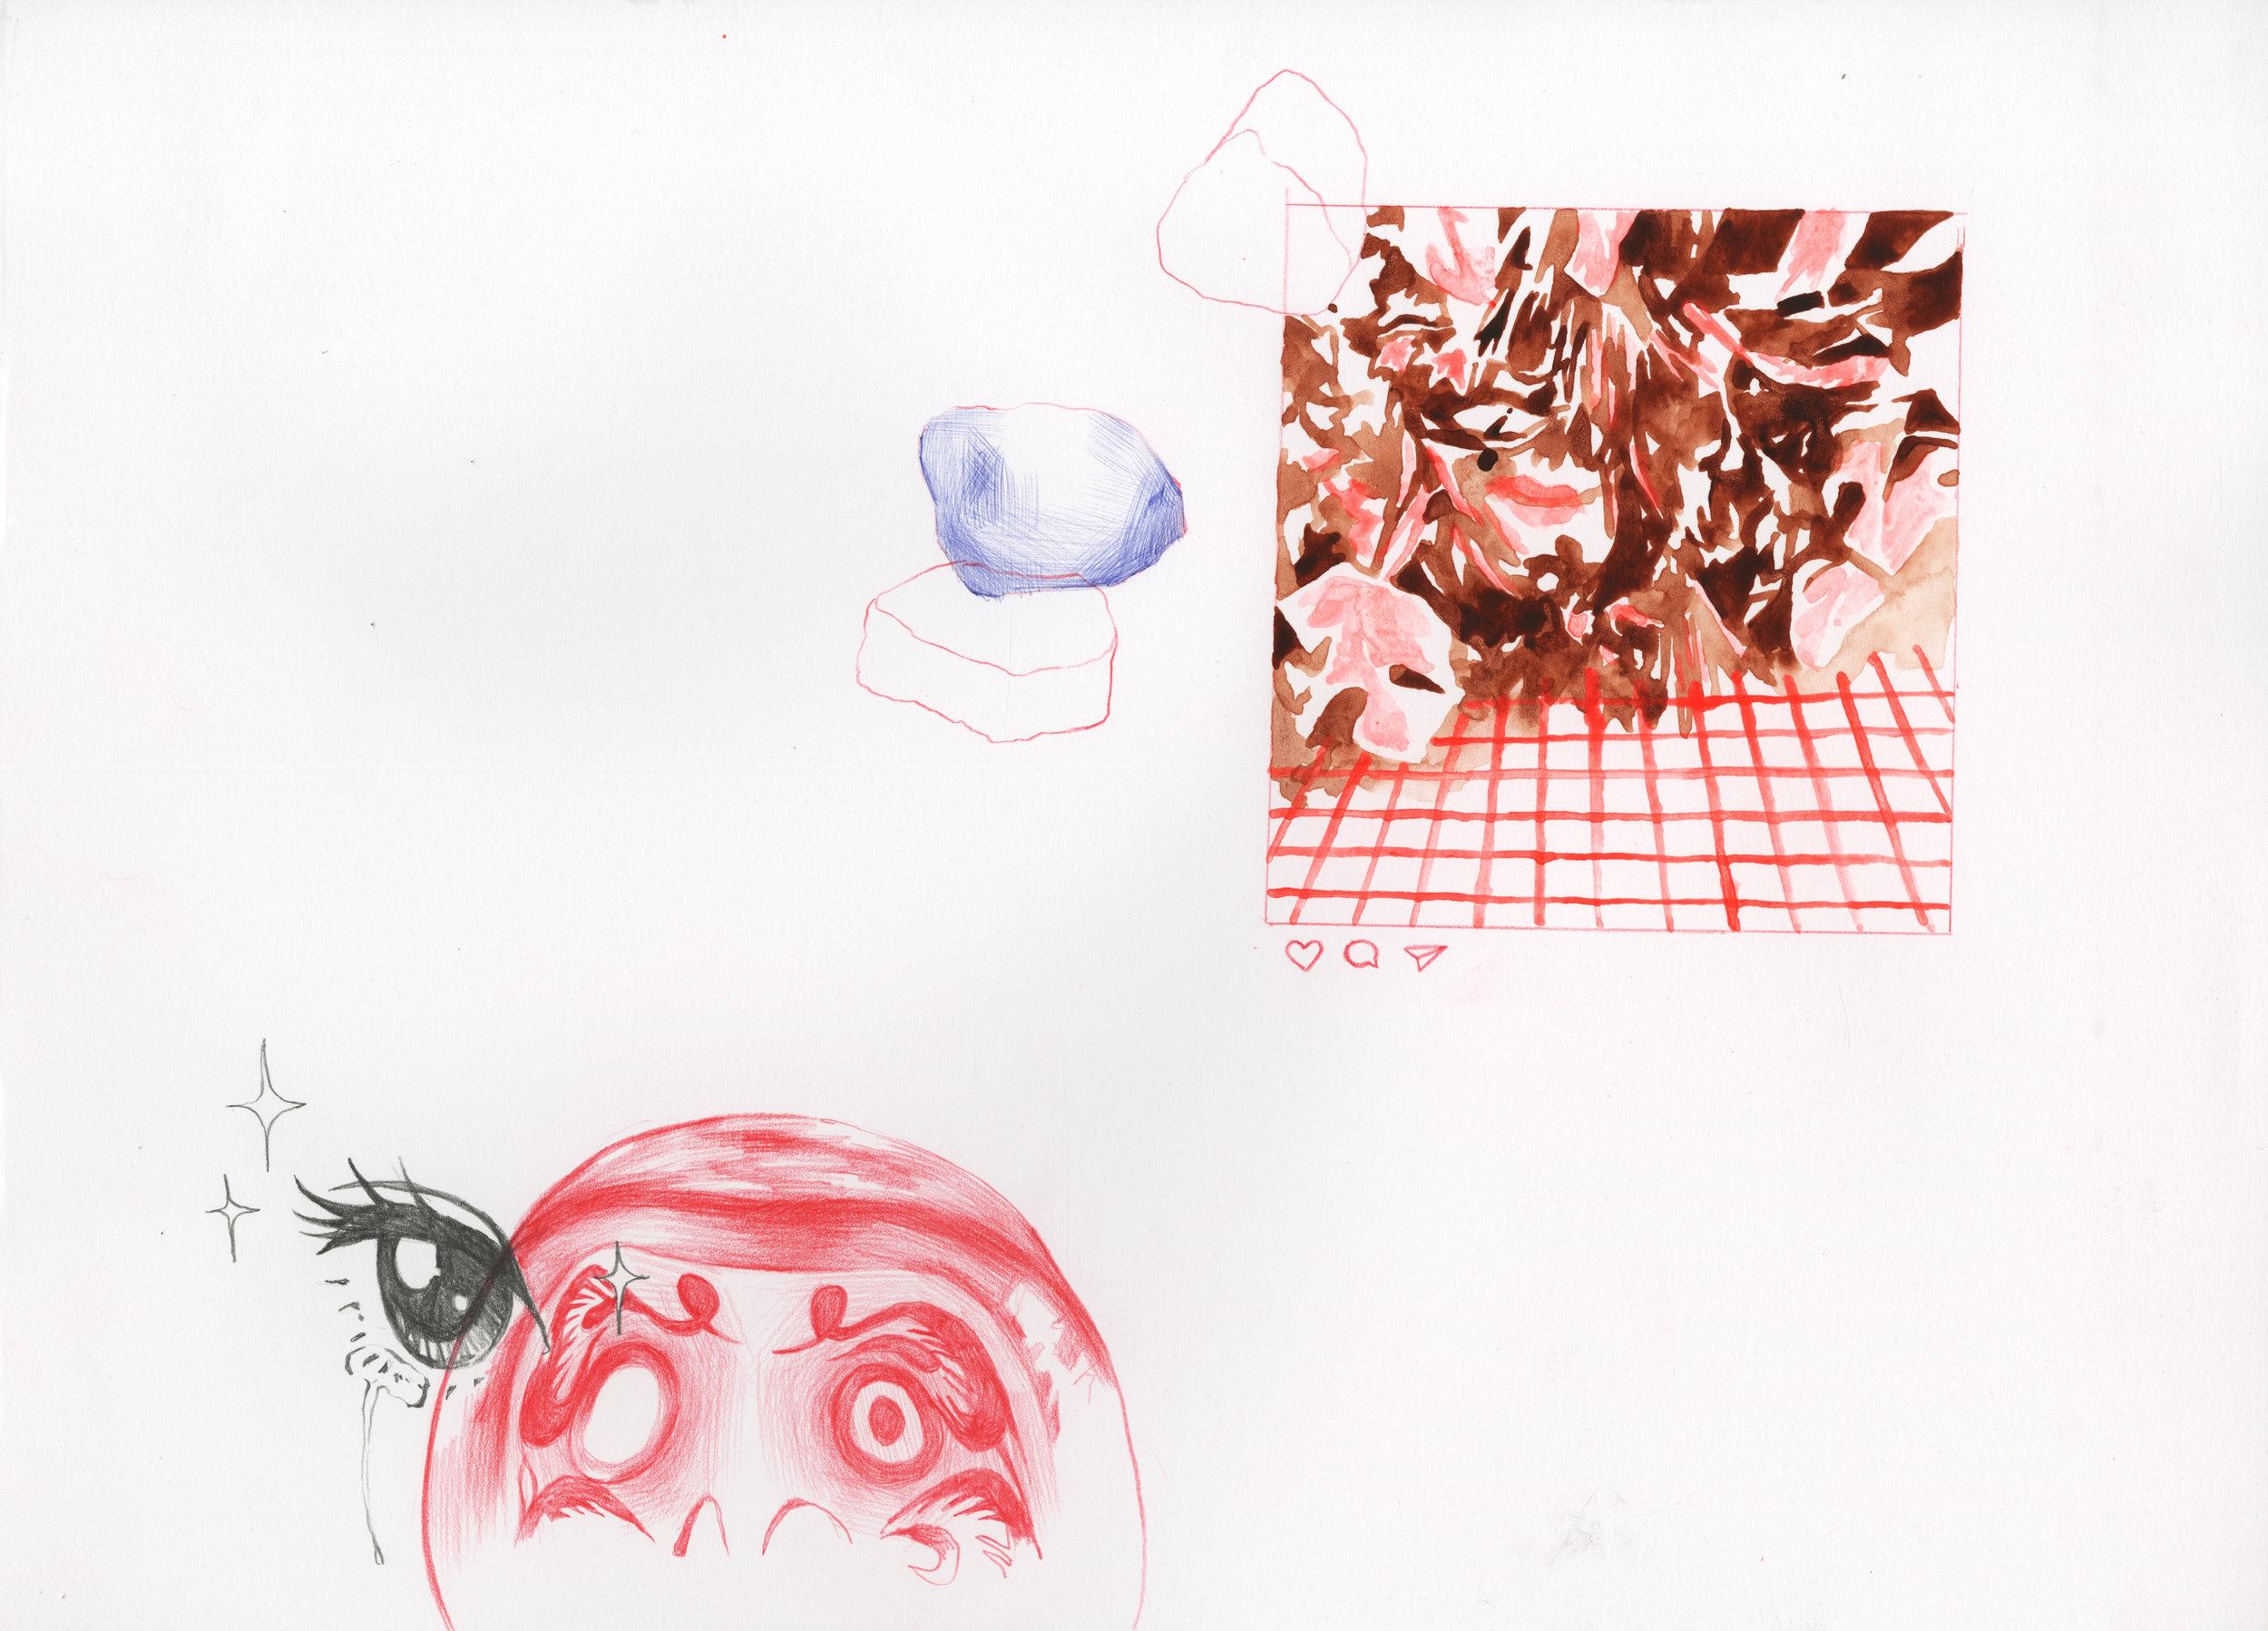 Window Offering  watercolor, colored pencil, ballpoint pen 11 x 14 in. 2017